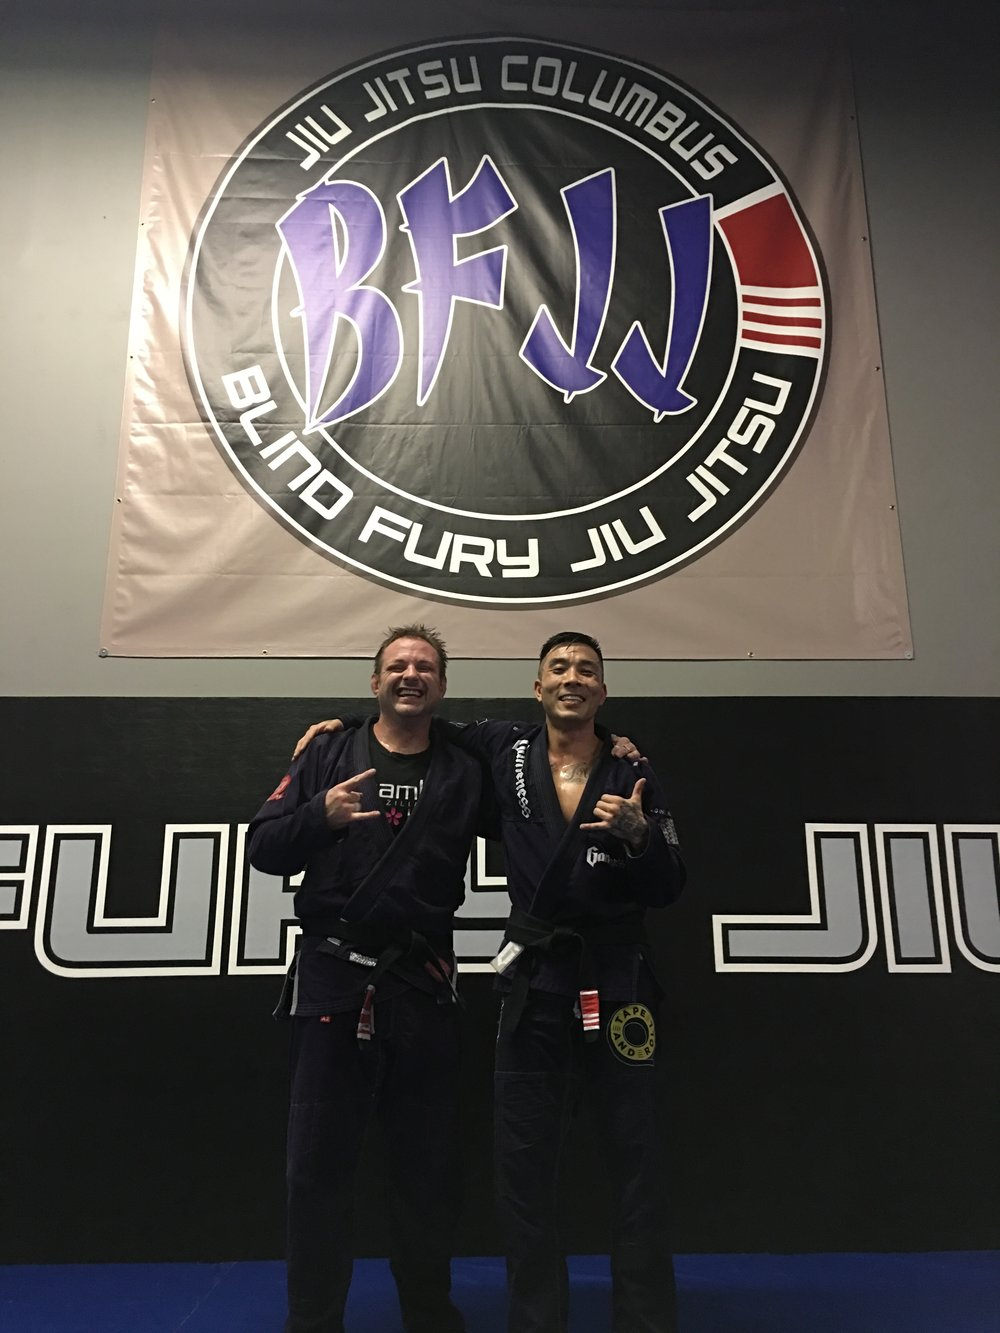 Jason Keaton and Prof. Kenny at Jiu Jitsu Columbus